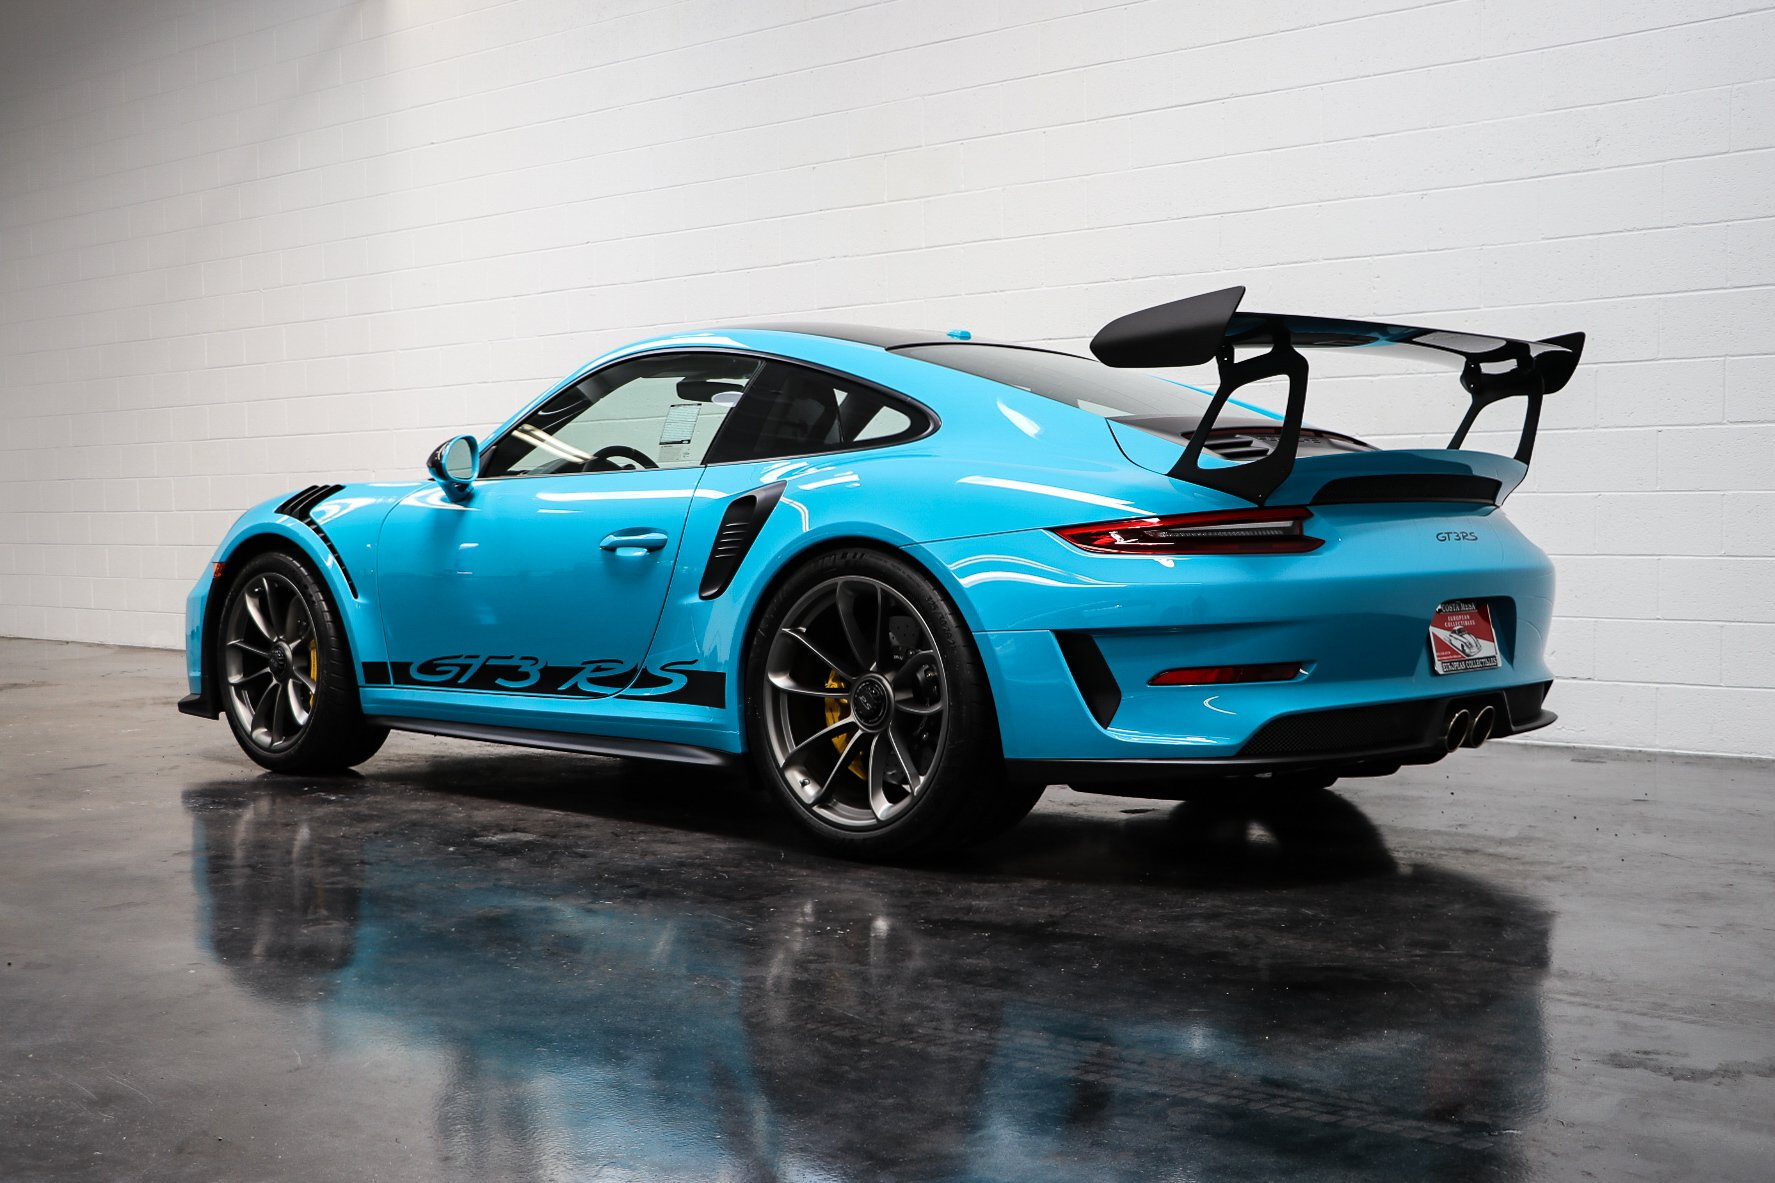 Porsche 991 2 Gt3 Rs 2019 Elferspot Com Marketplace For Porsche Sports Cars